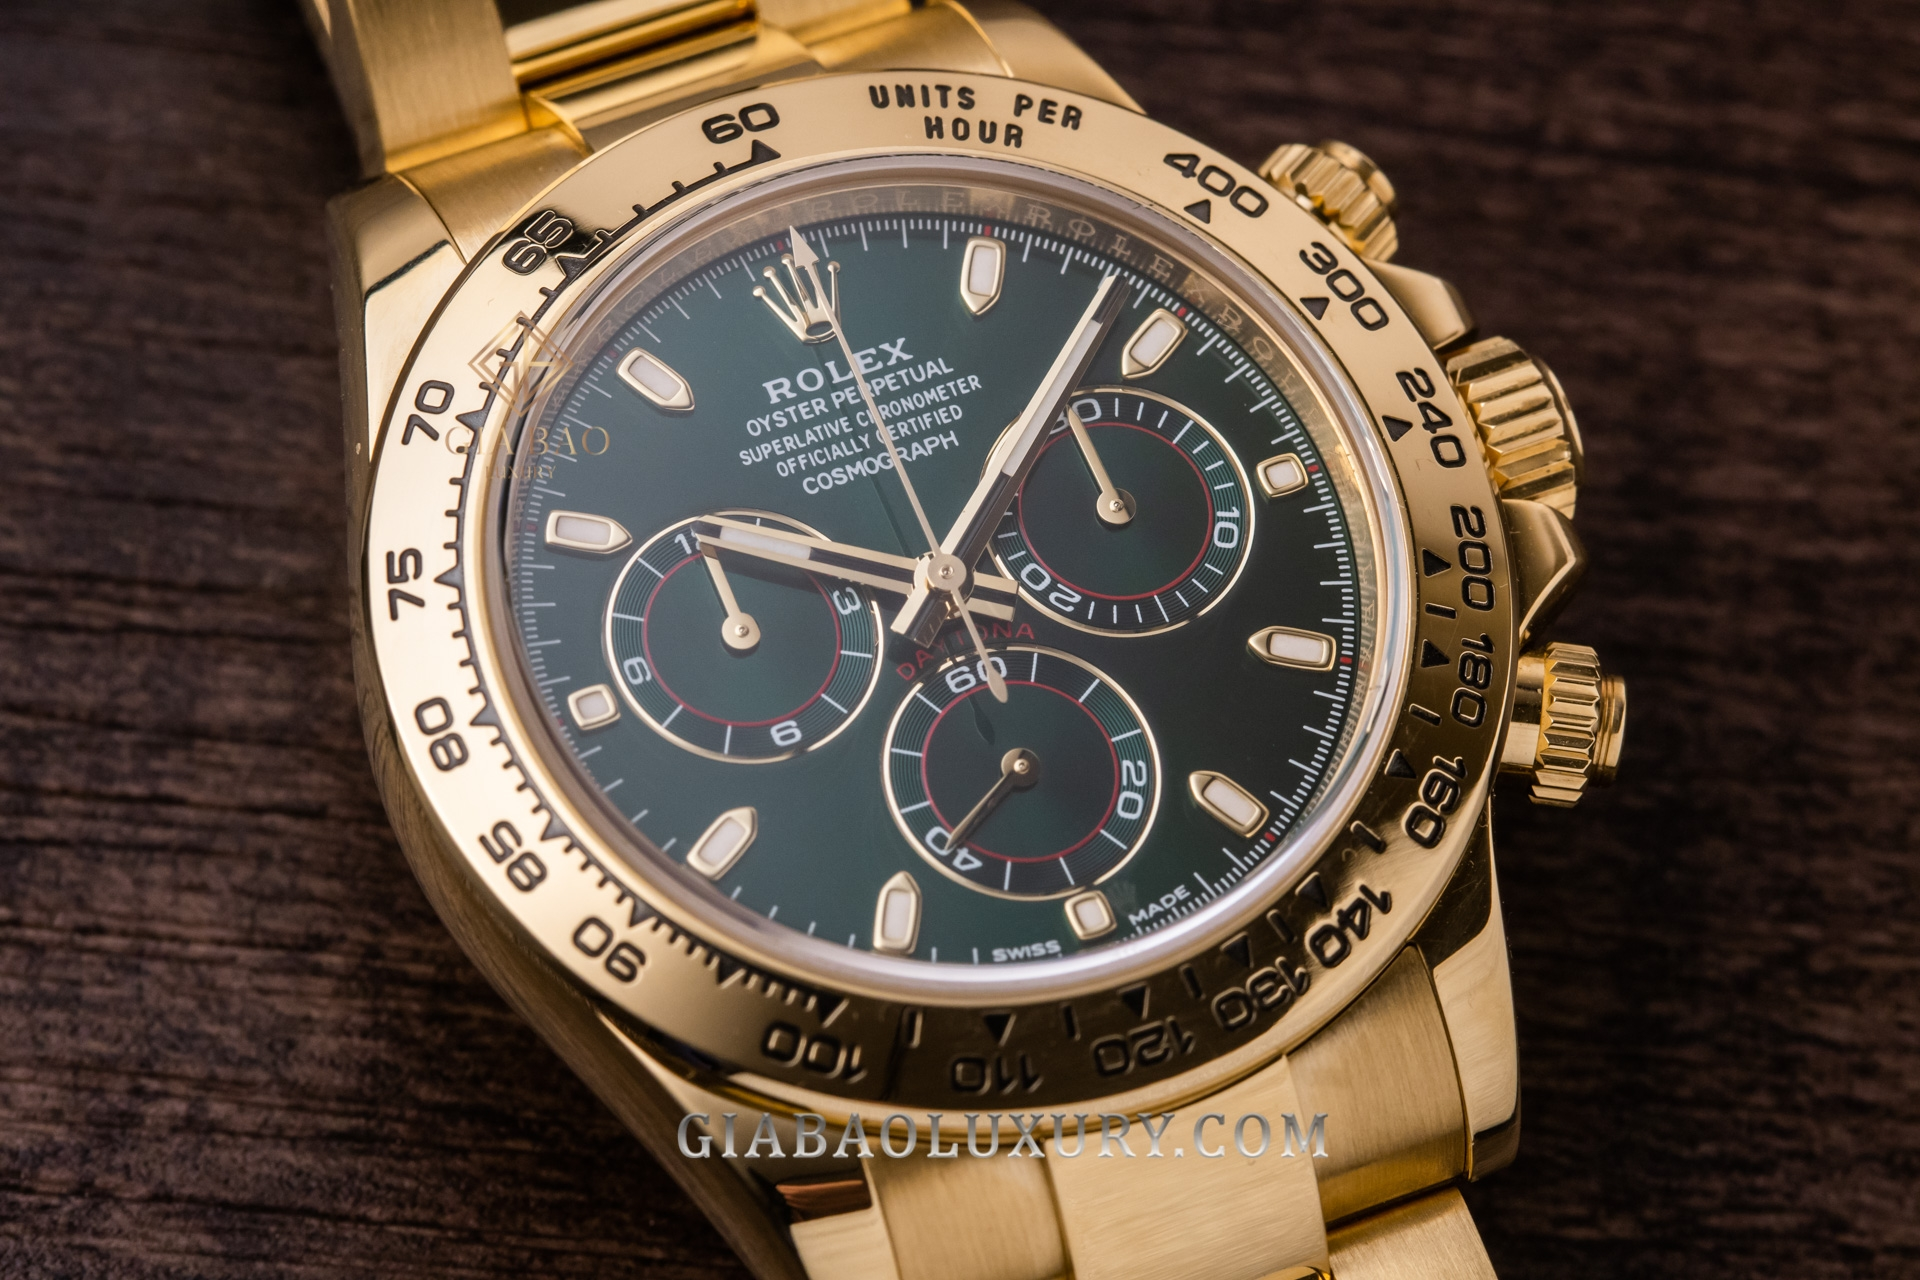 Đồng Hồ Rolex Cosmograph Daytona 116508 Mặt Số Xanh Lá